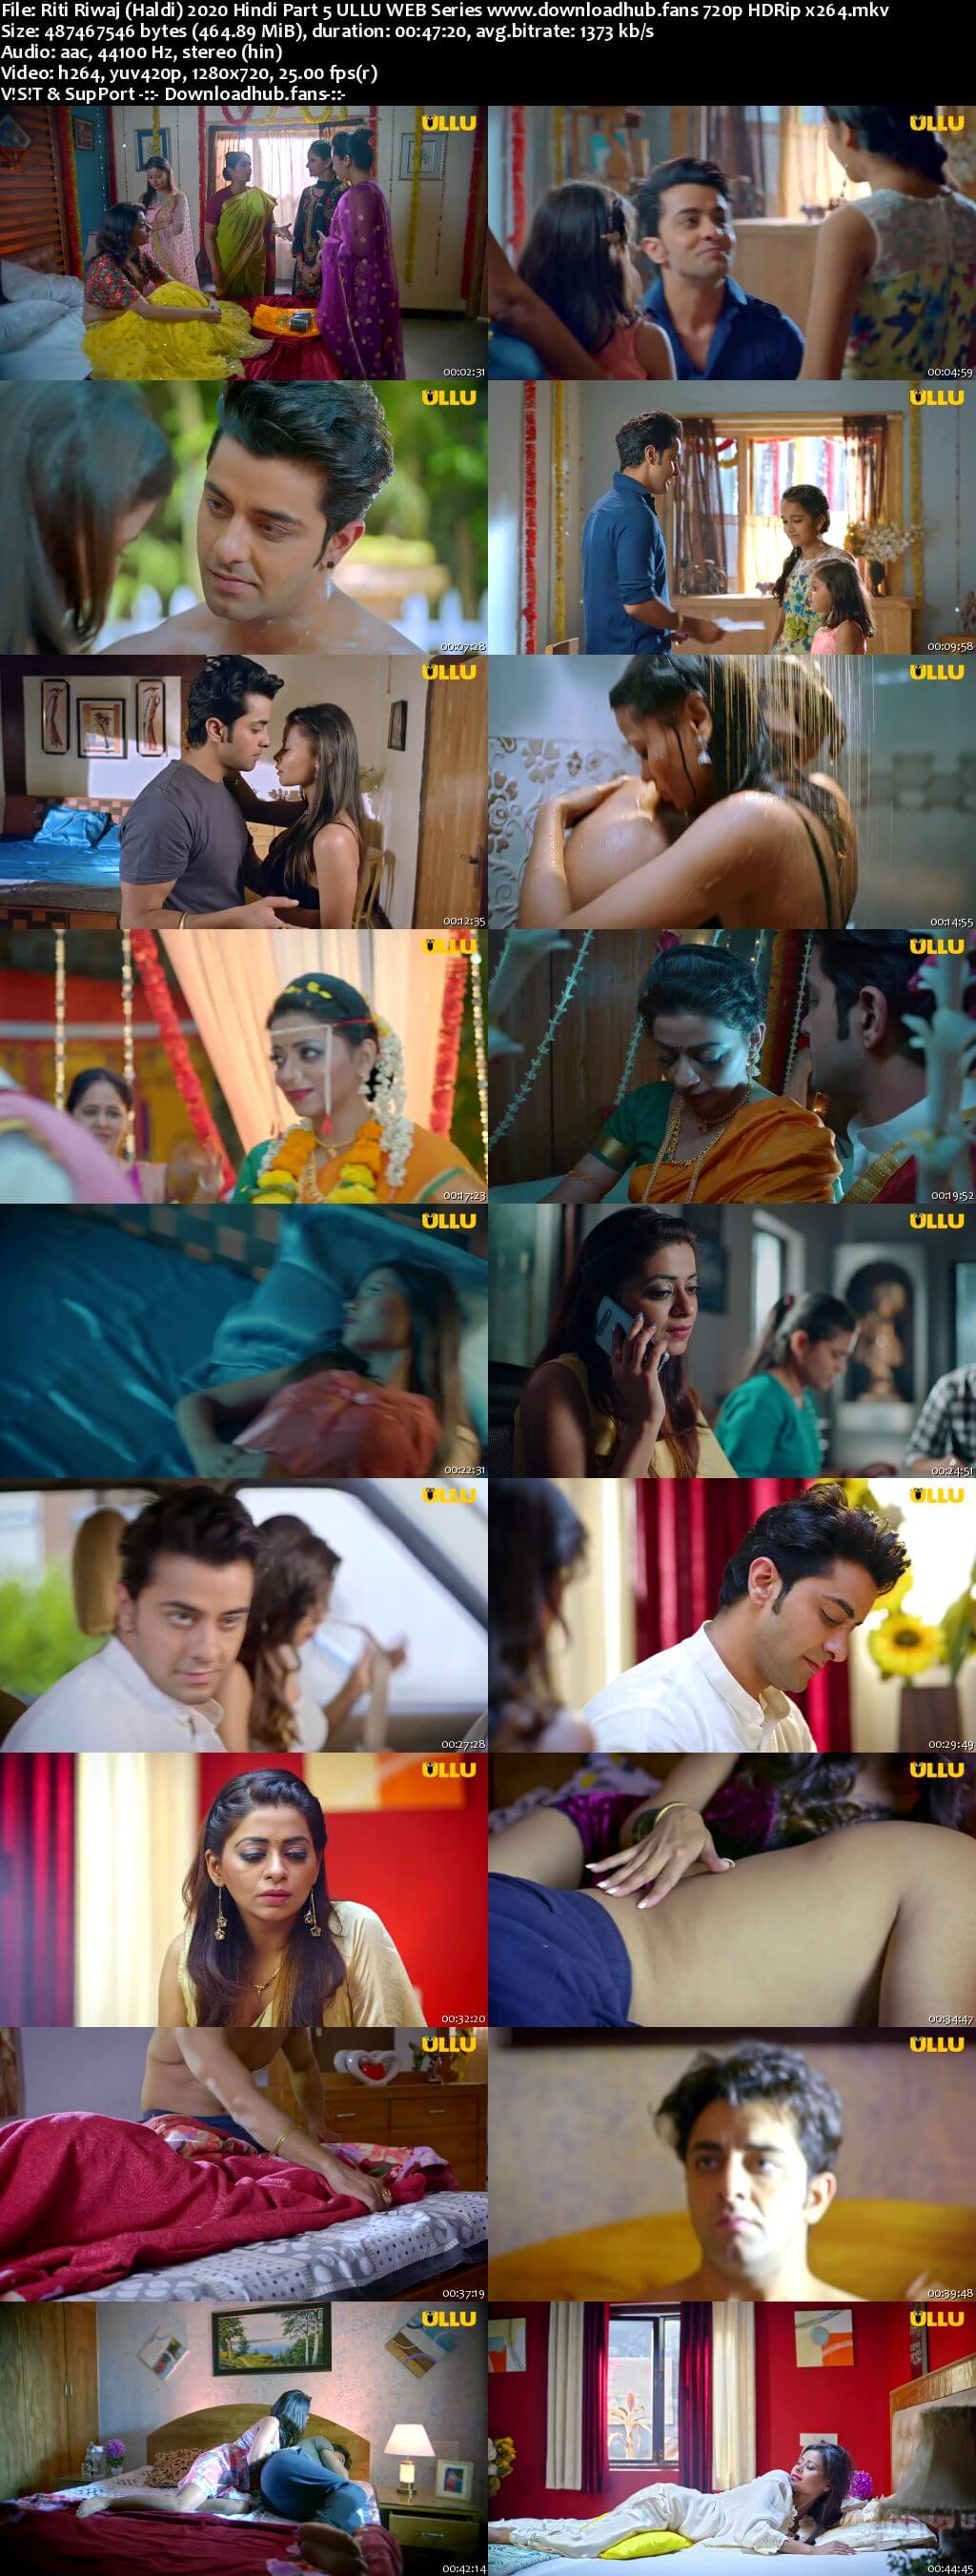 Riti Riwaj (Haldi) 2020 Hindi Part 5 ULLU WEB Series 720p HDRip x264